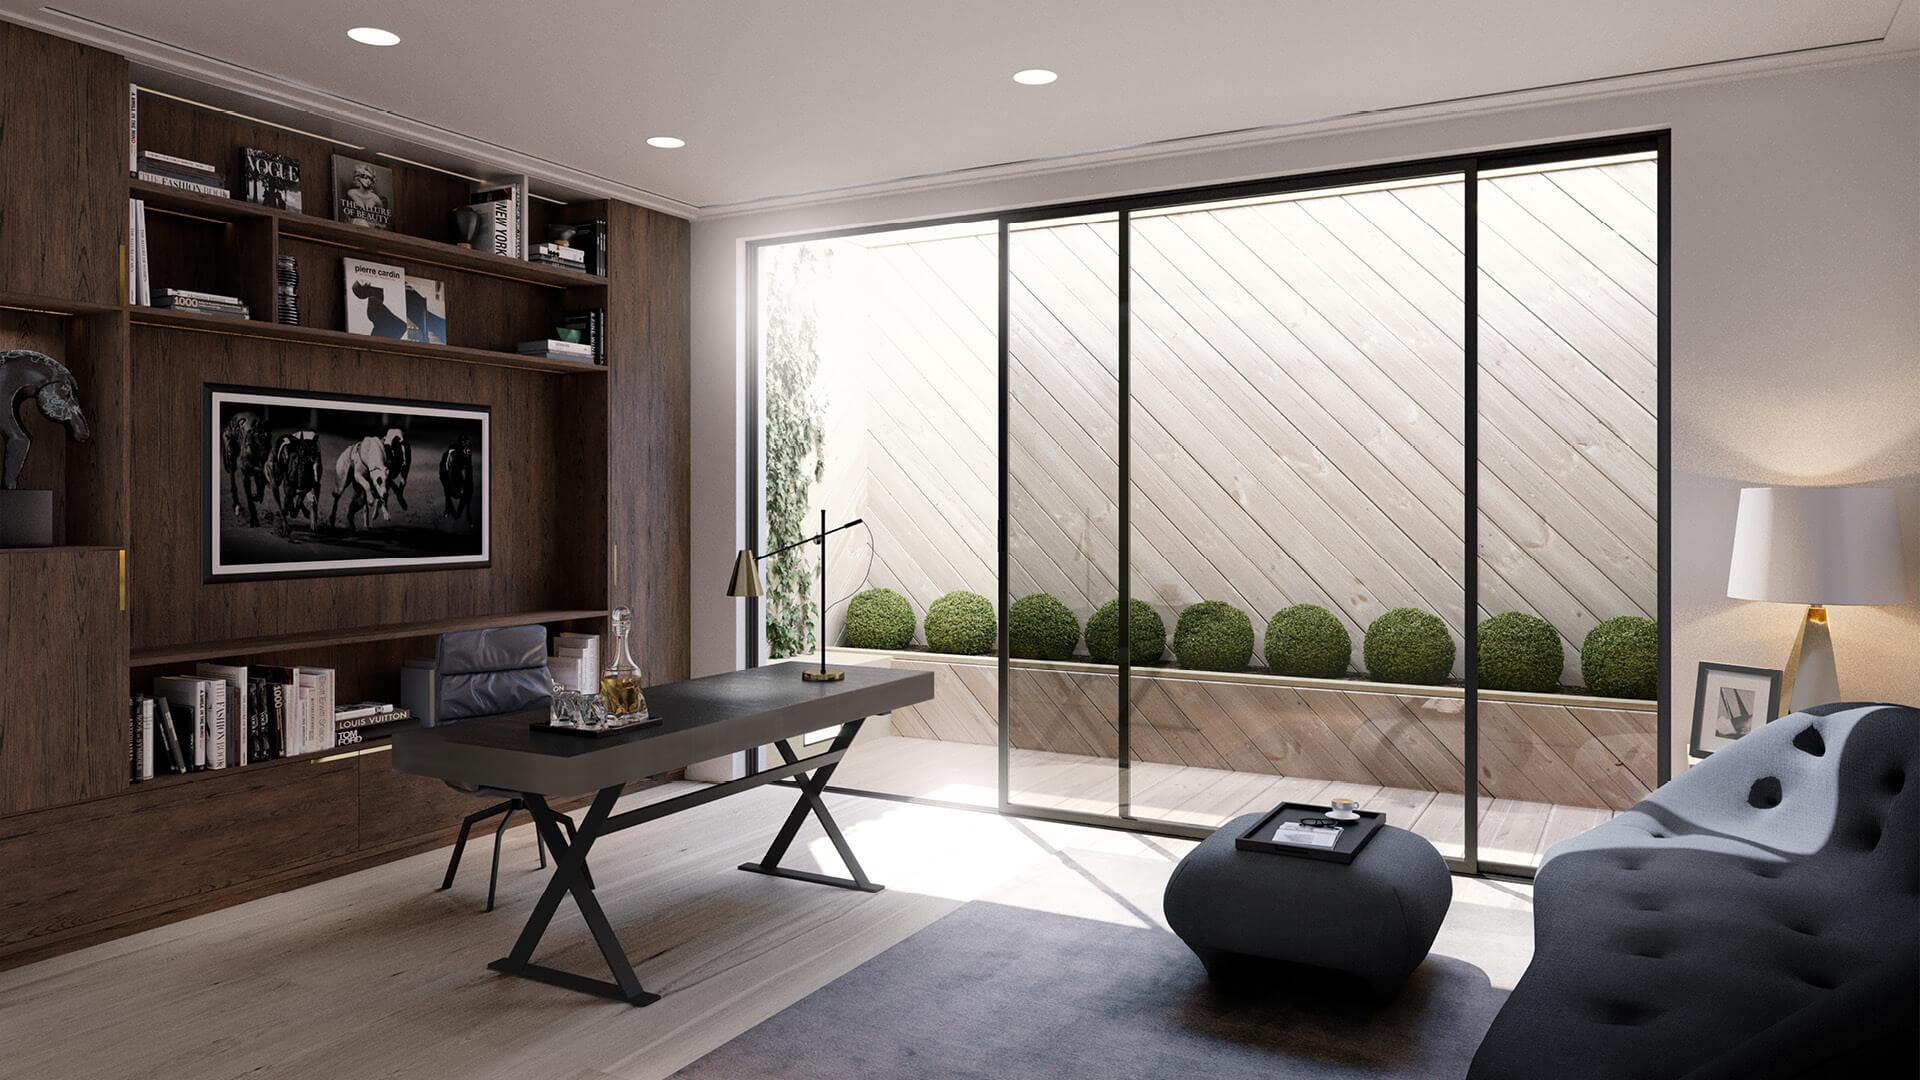 Sanders Studios_Fusion_The Birchwood_Study Room CGI